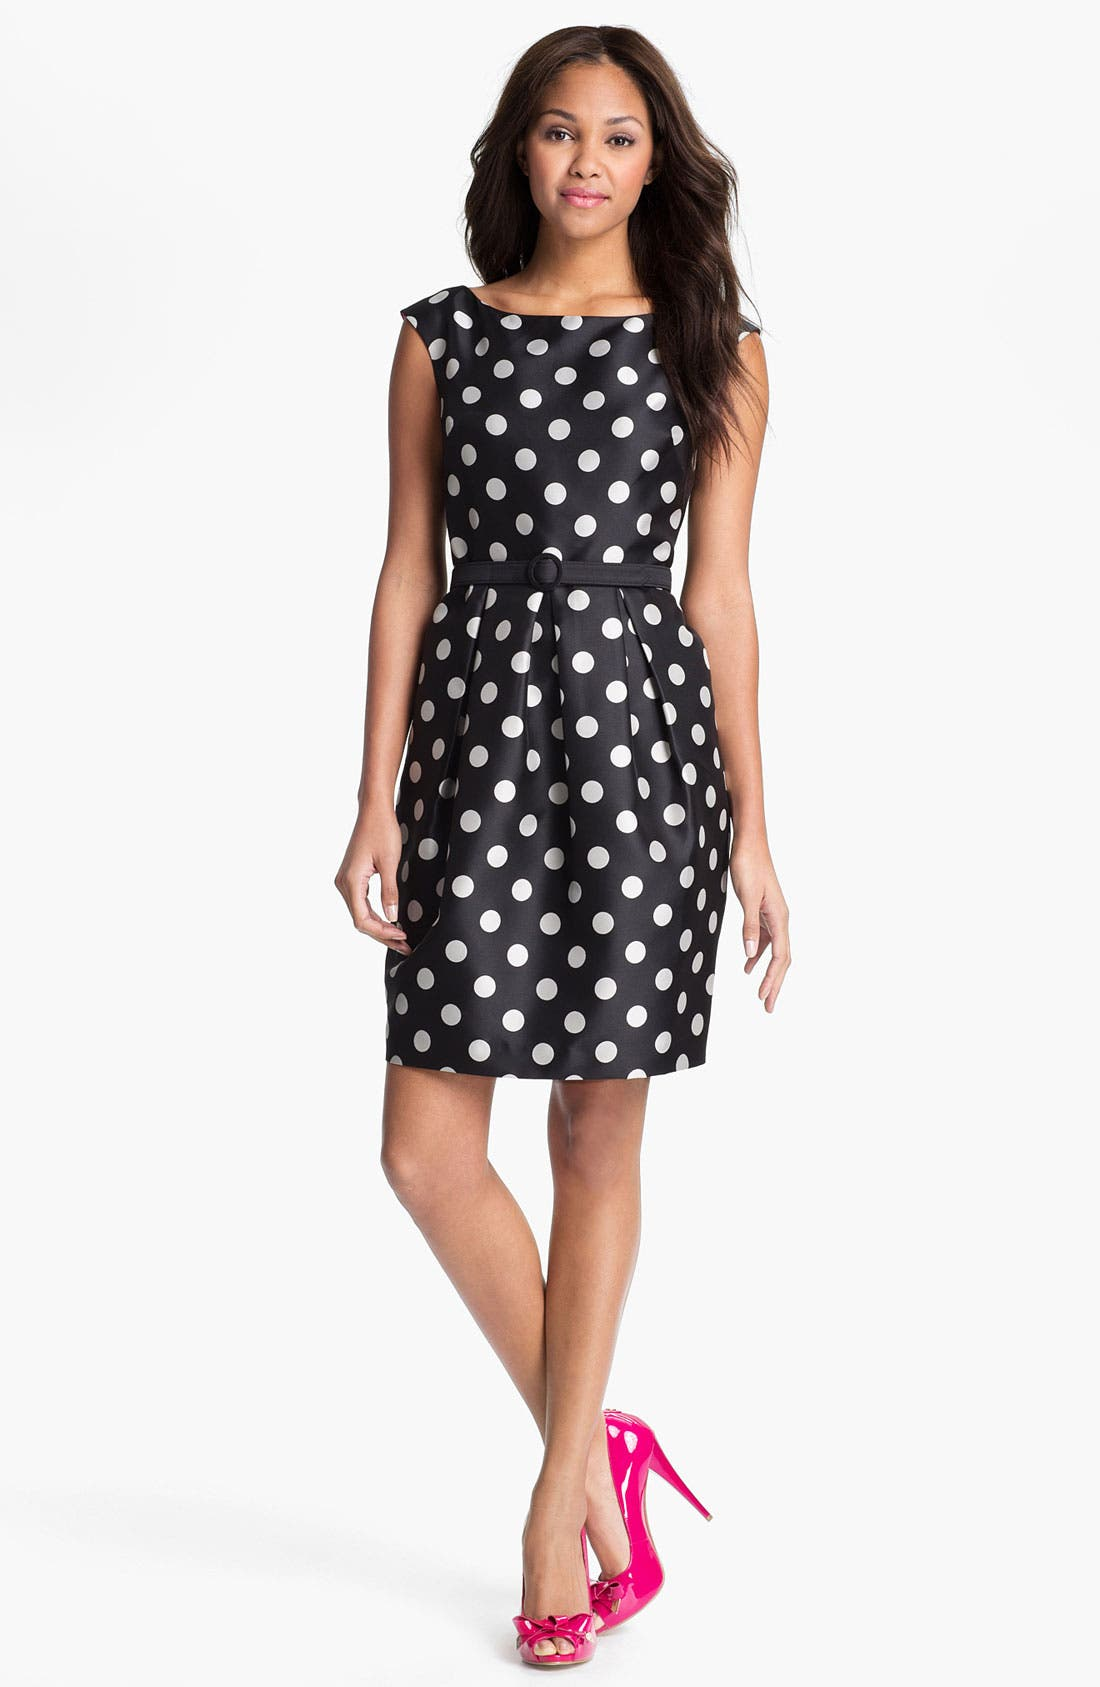 Alternate Image 1 Selected - Eliza J Polka Dot Tulip Dress (Regular & Petite)